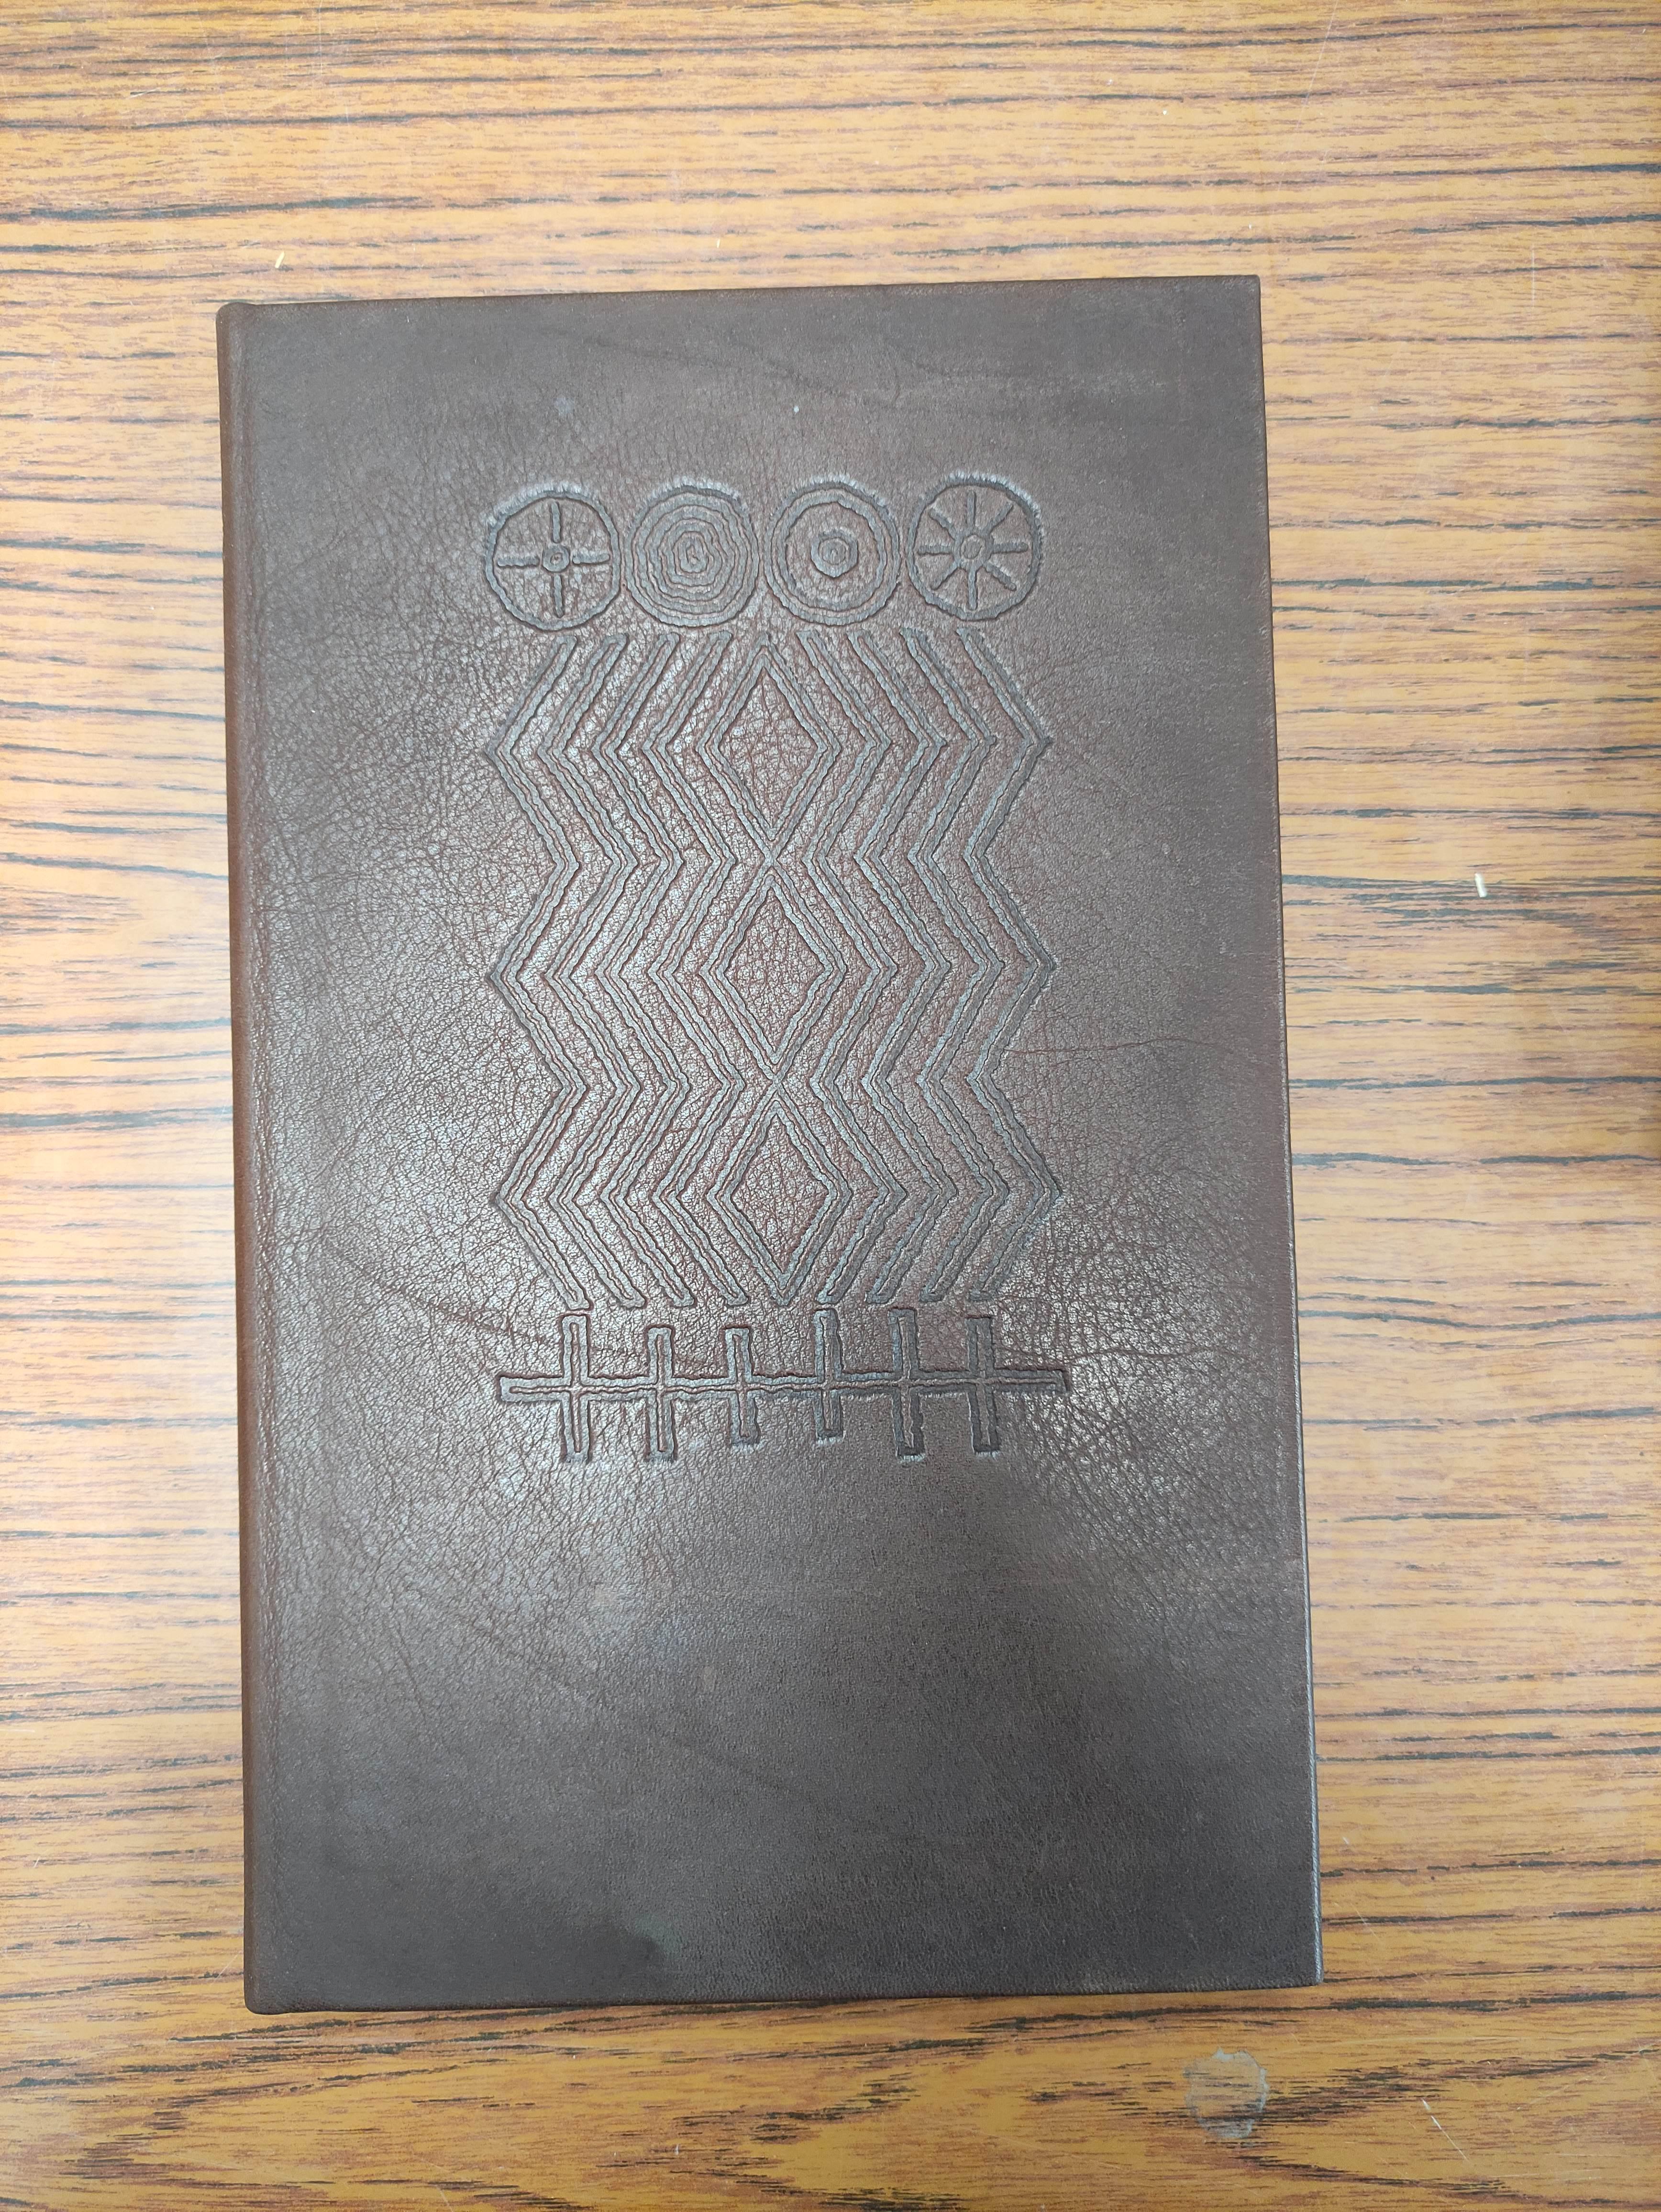 HEANEY SEAMUS.Poems & Memoir. Signed ltd. ed. 1197/2000. Plates. Folio. Calf in slip case. Limited - Image 3 of 8